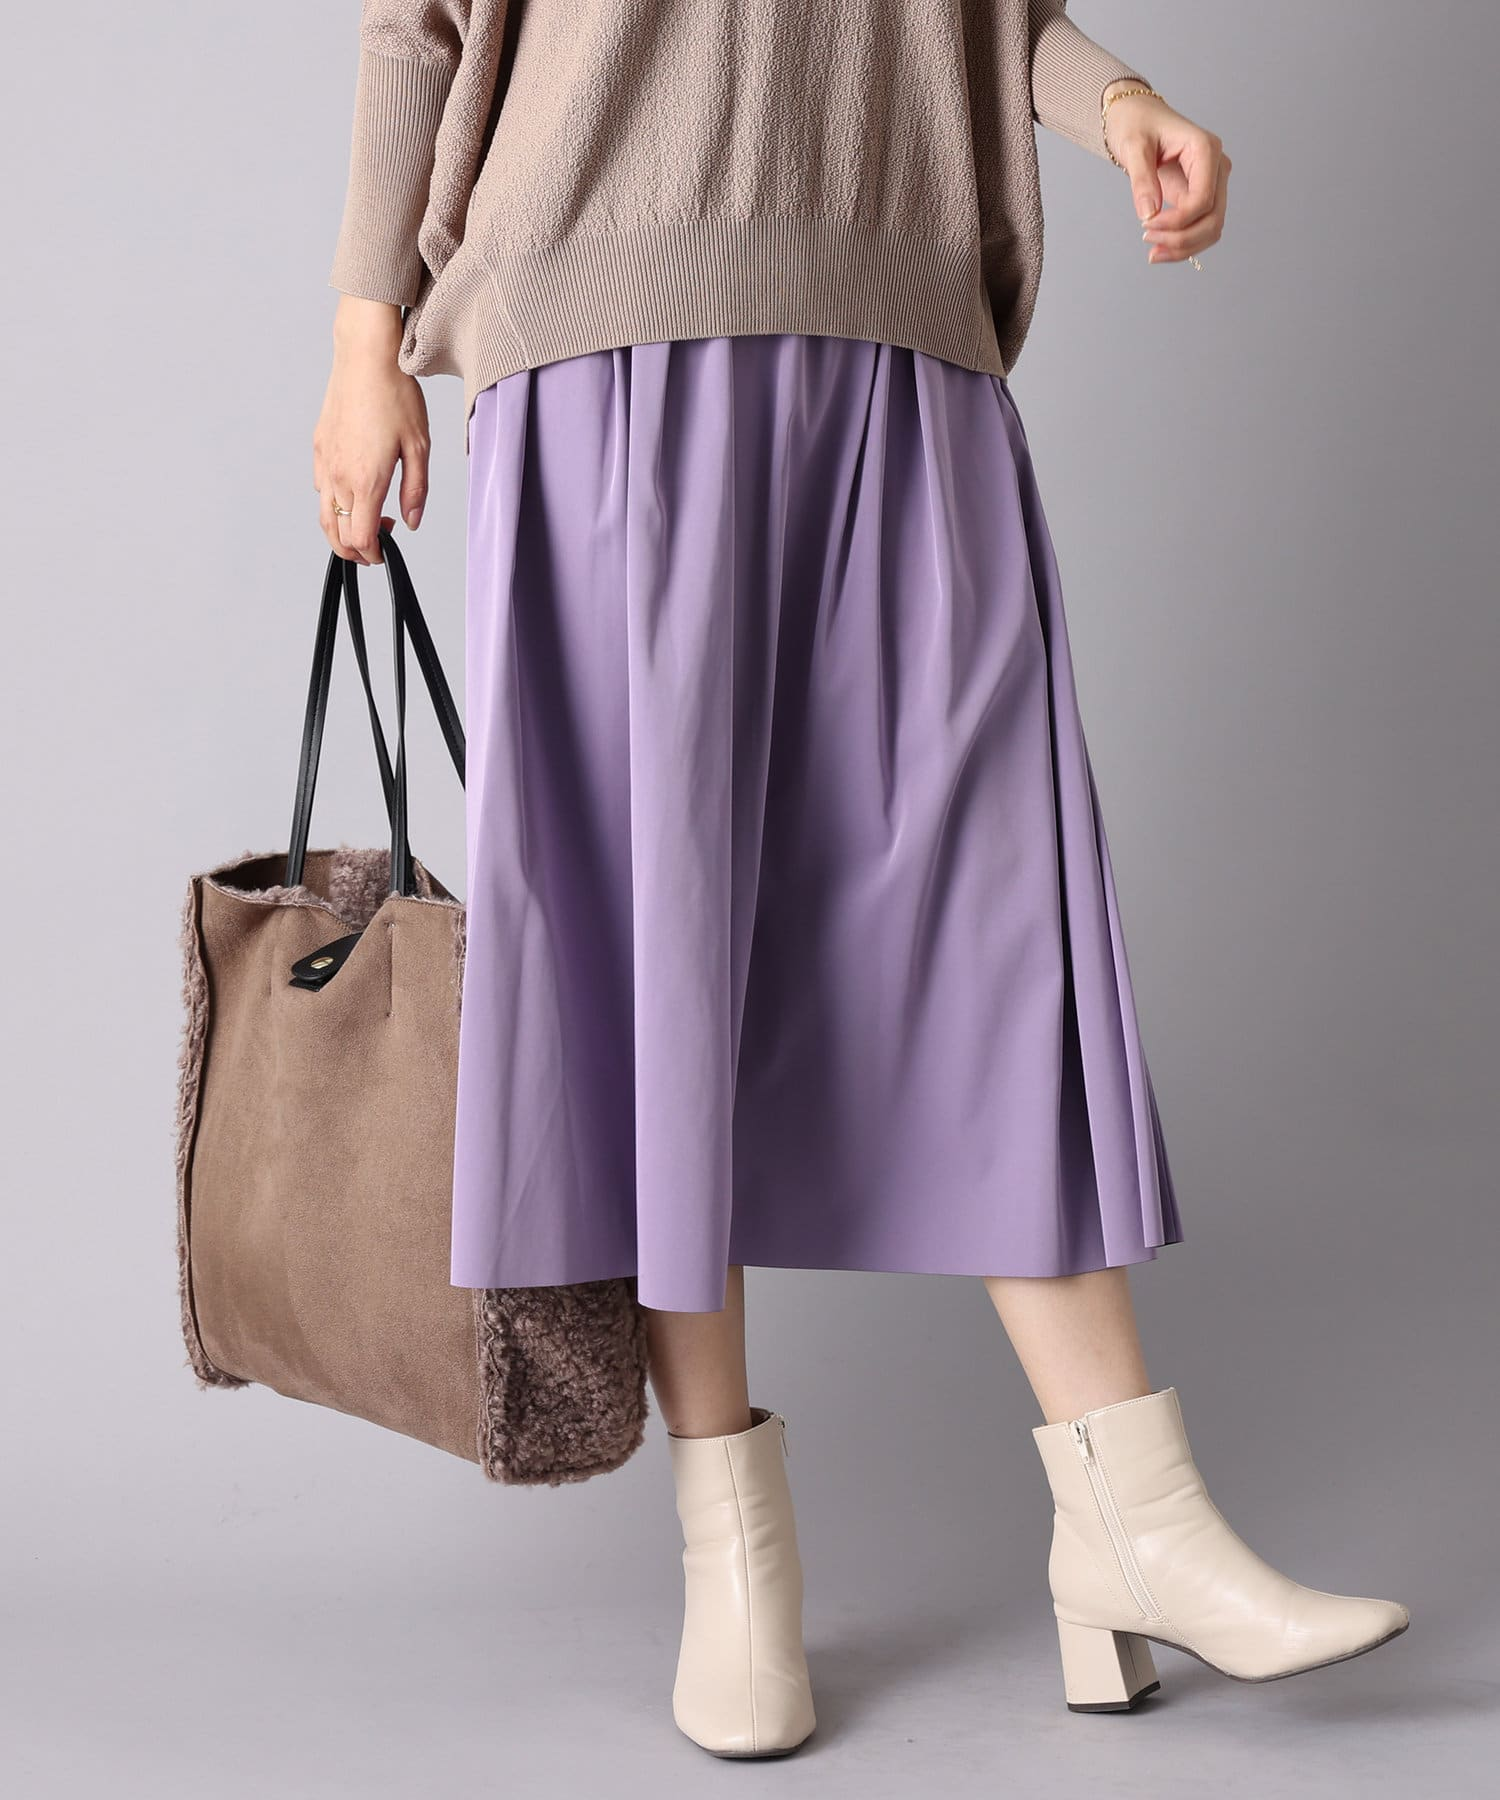 un dix cors(アンディコール) 【その日の気分で着まわせる】リバーシブルタフタギャザースカート